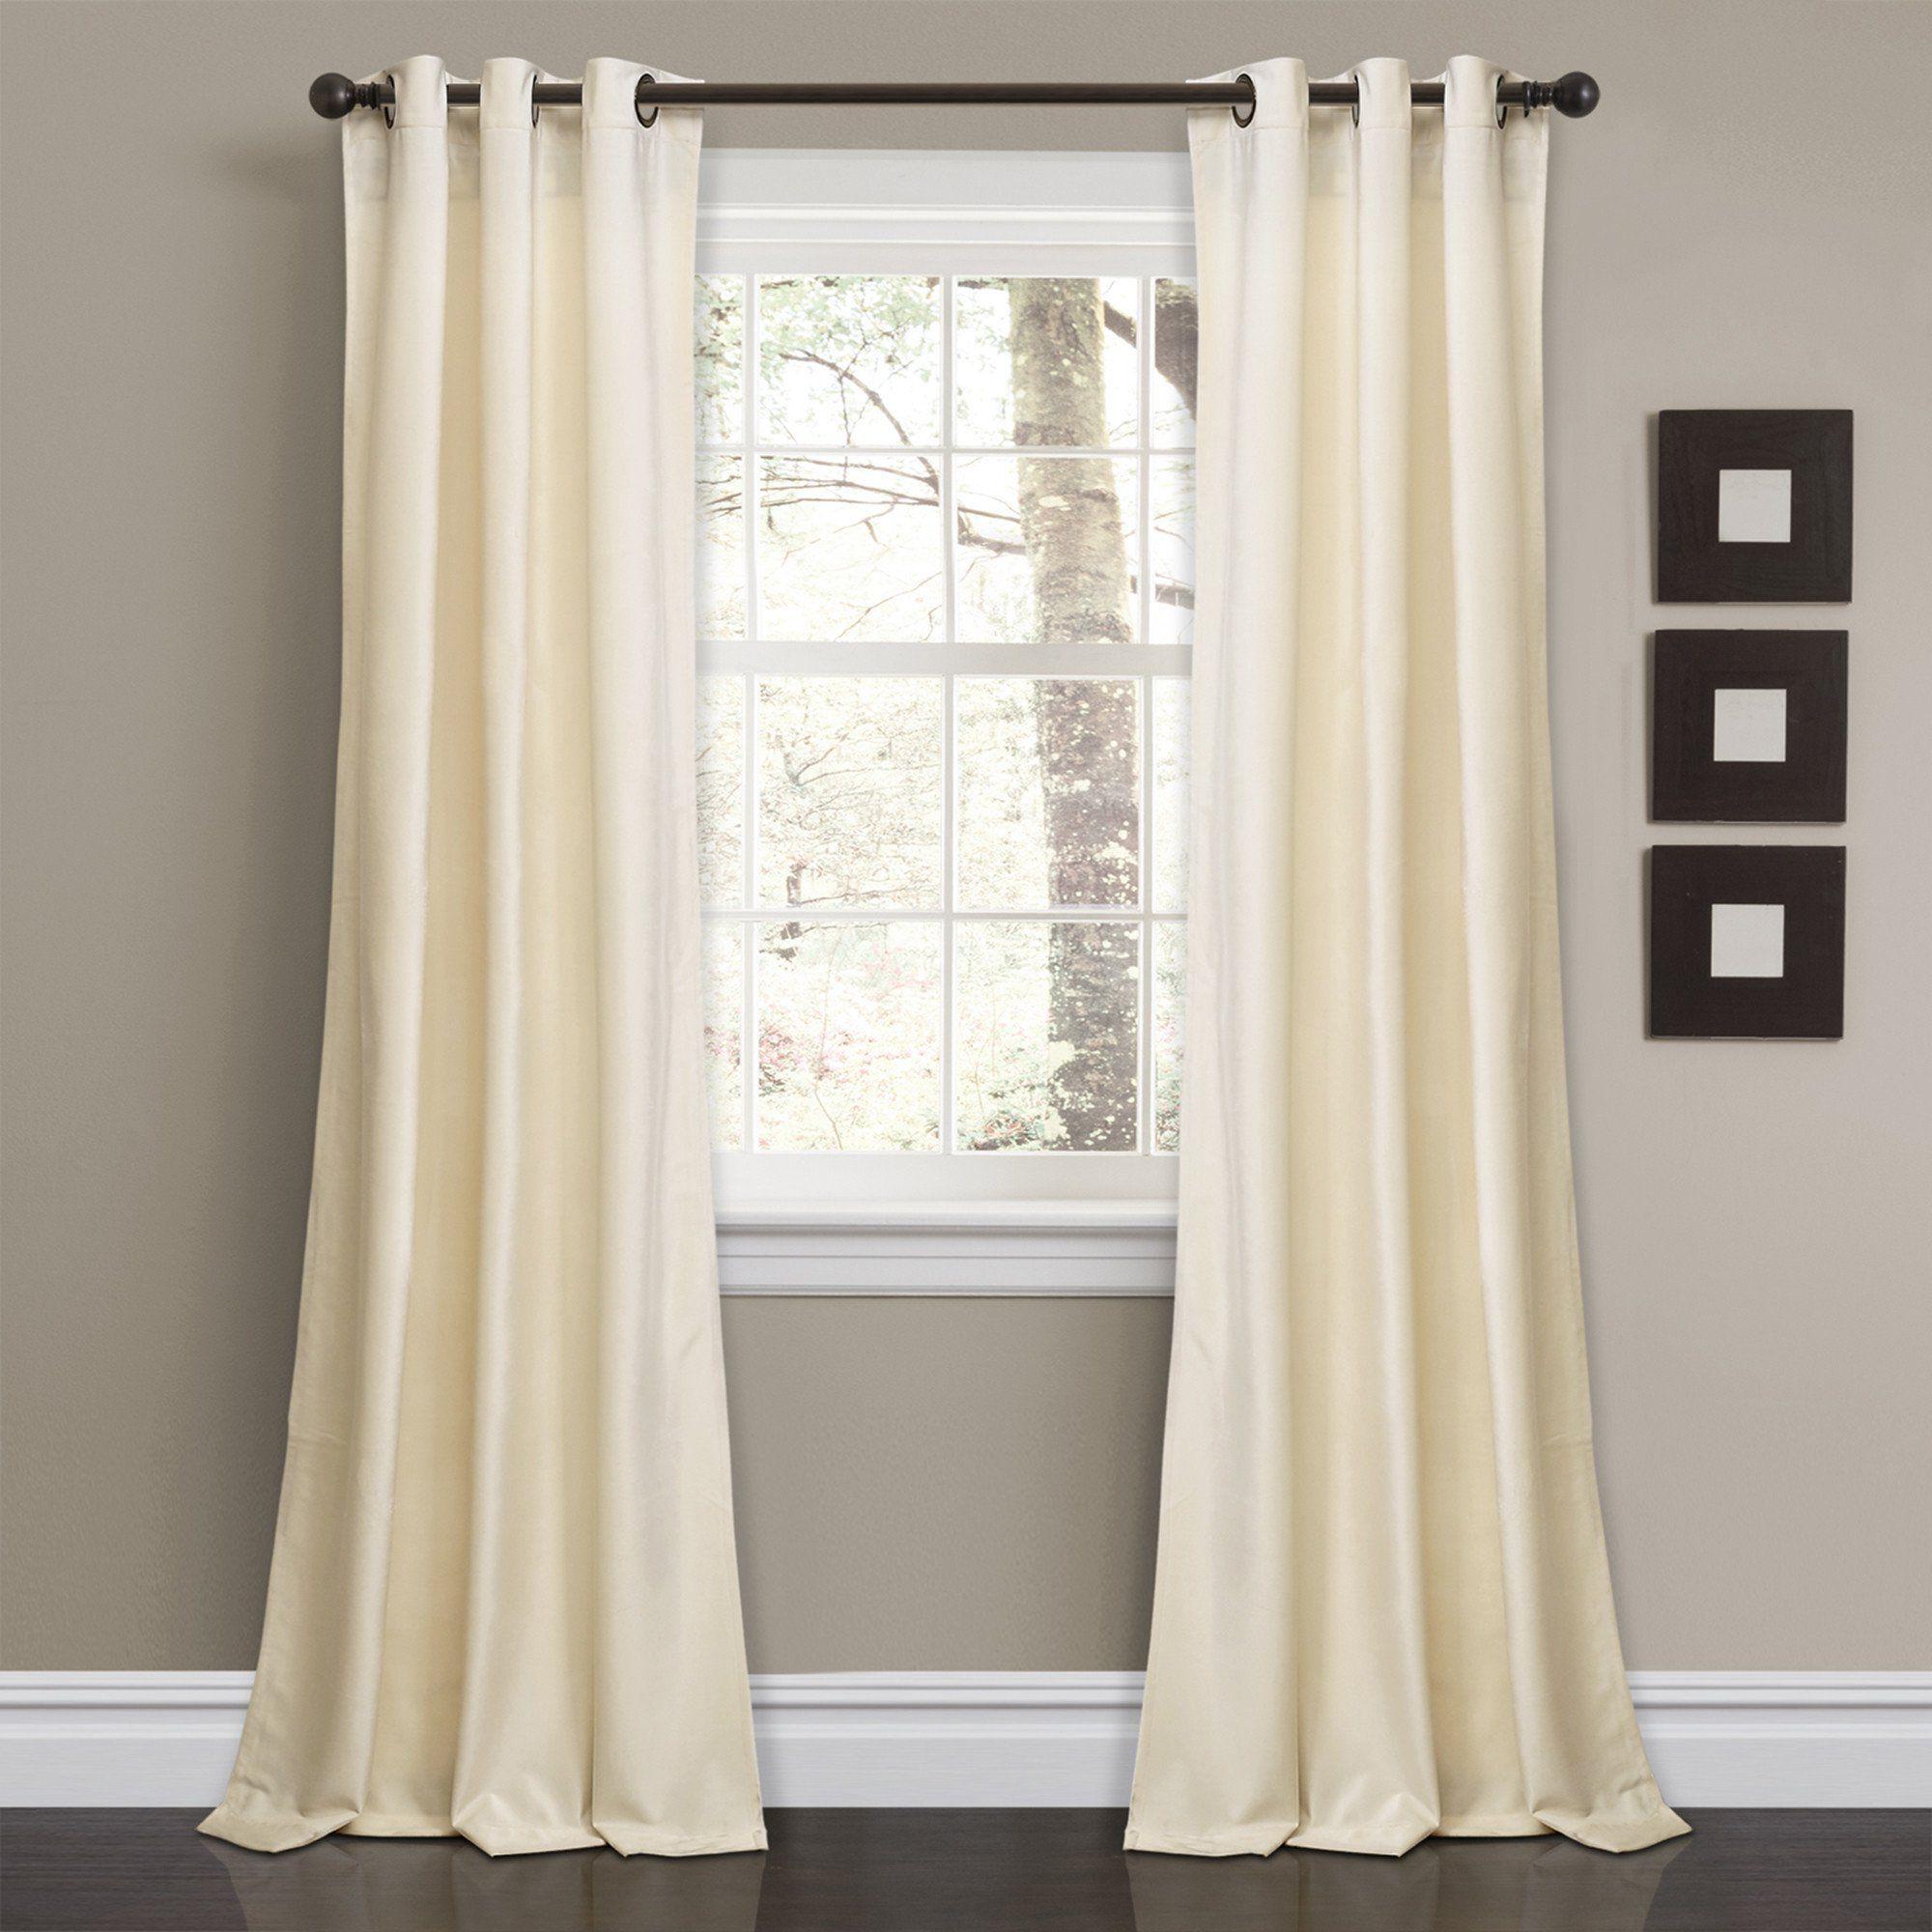 Fashionable Velvet Solid Room Darkening Window Curtain Panel Sets In Prima Velvet Solid Room Darkening Window Curtain Panel Set (View 2 of 20)